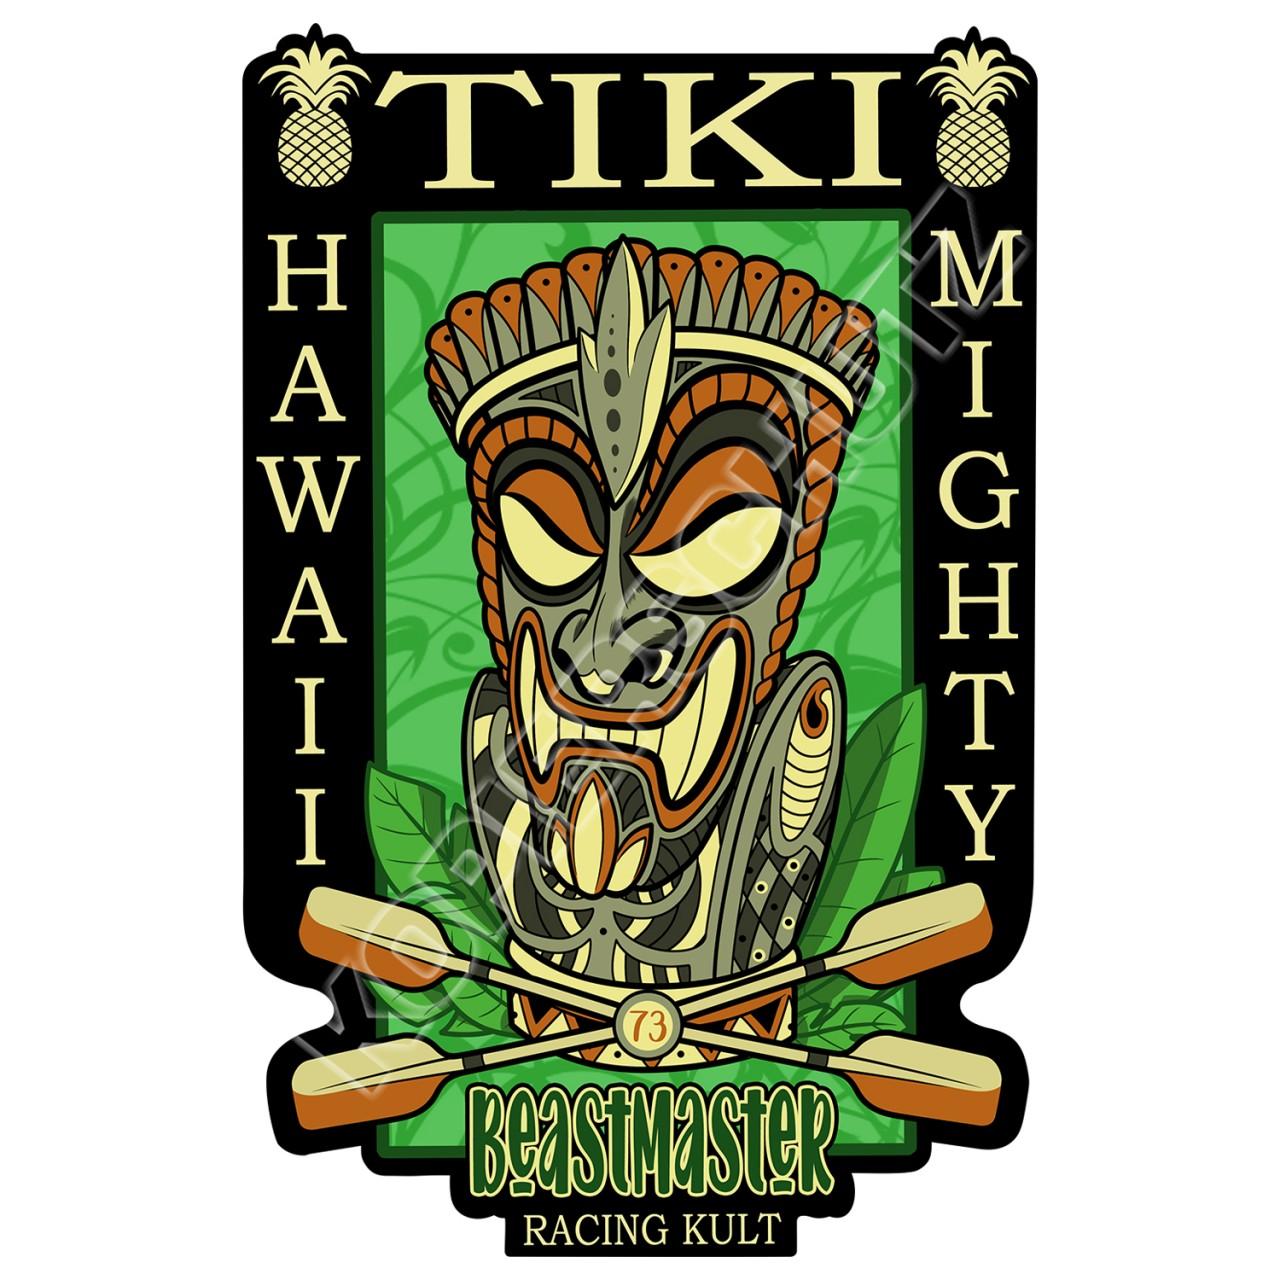 Racing Kult Aufkleber Tiki Beastmaster in verschiedenen Größen